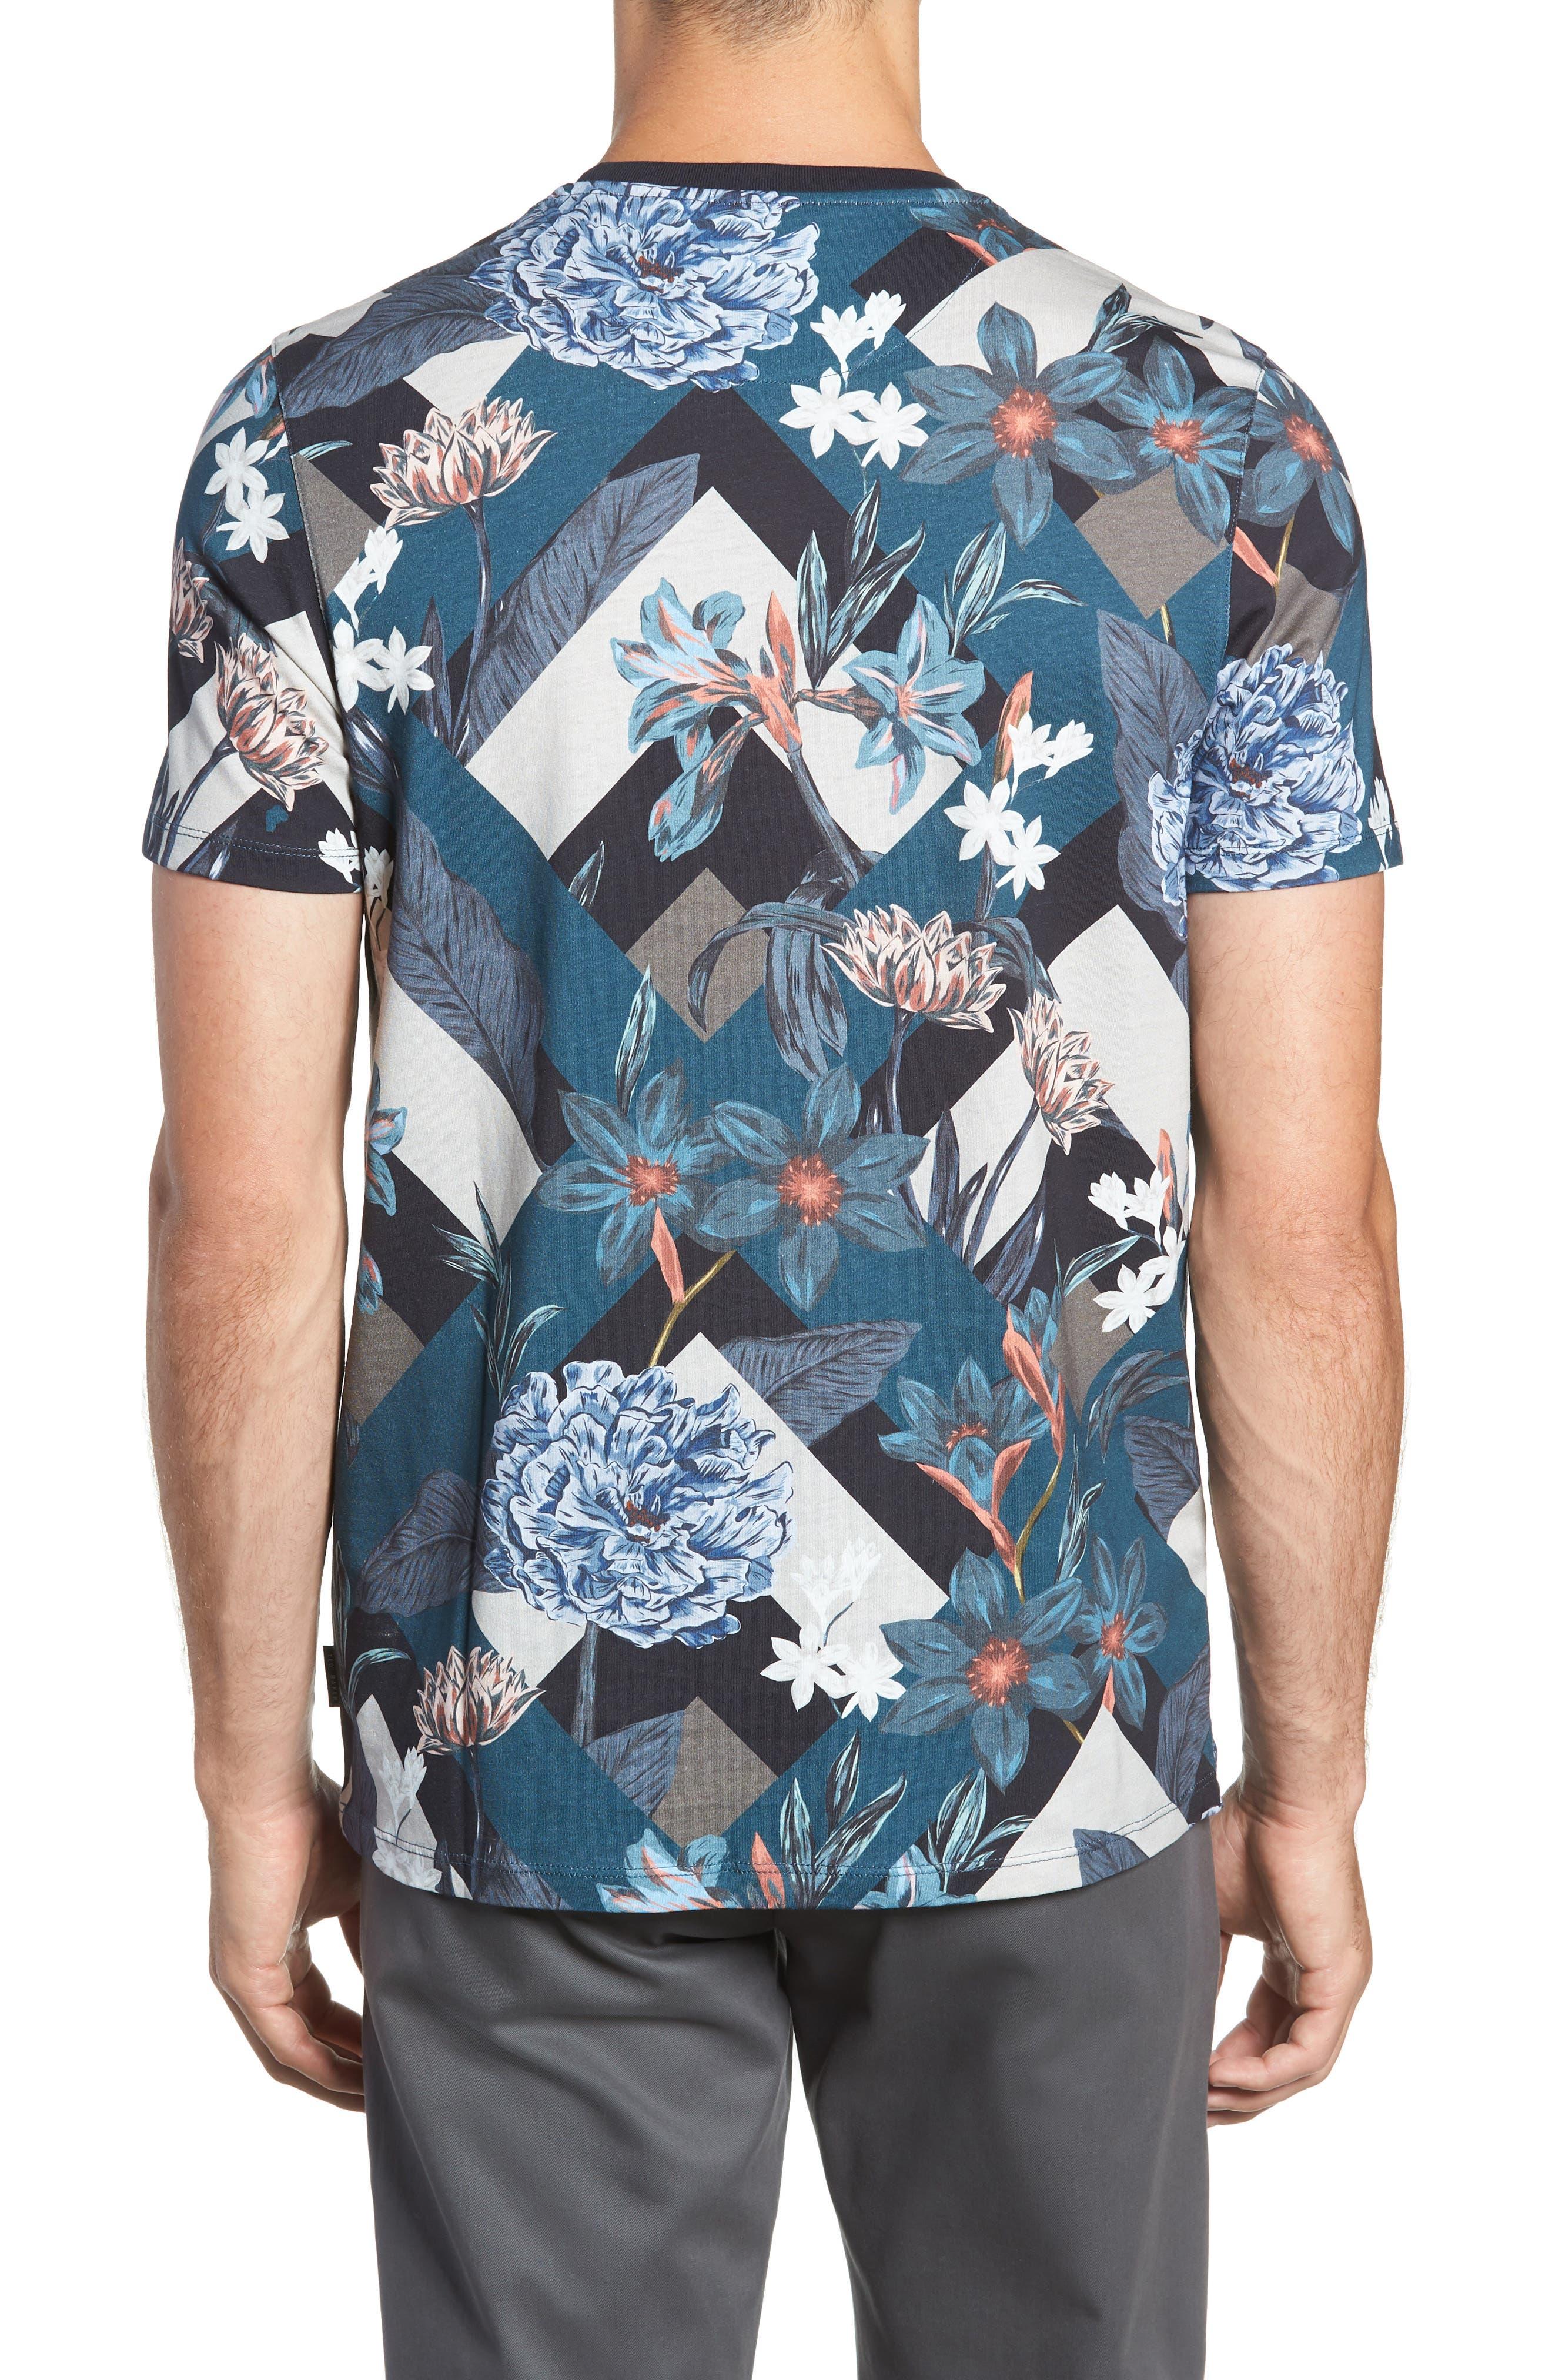 Jolly Slim Fit T-Shirt,                             Alternate thumbnail 2, color,                             410